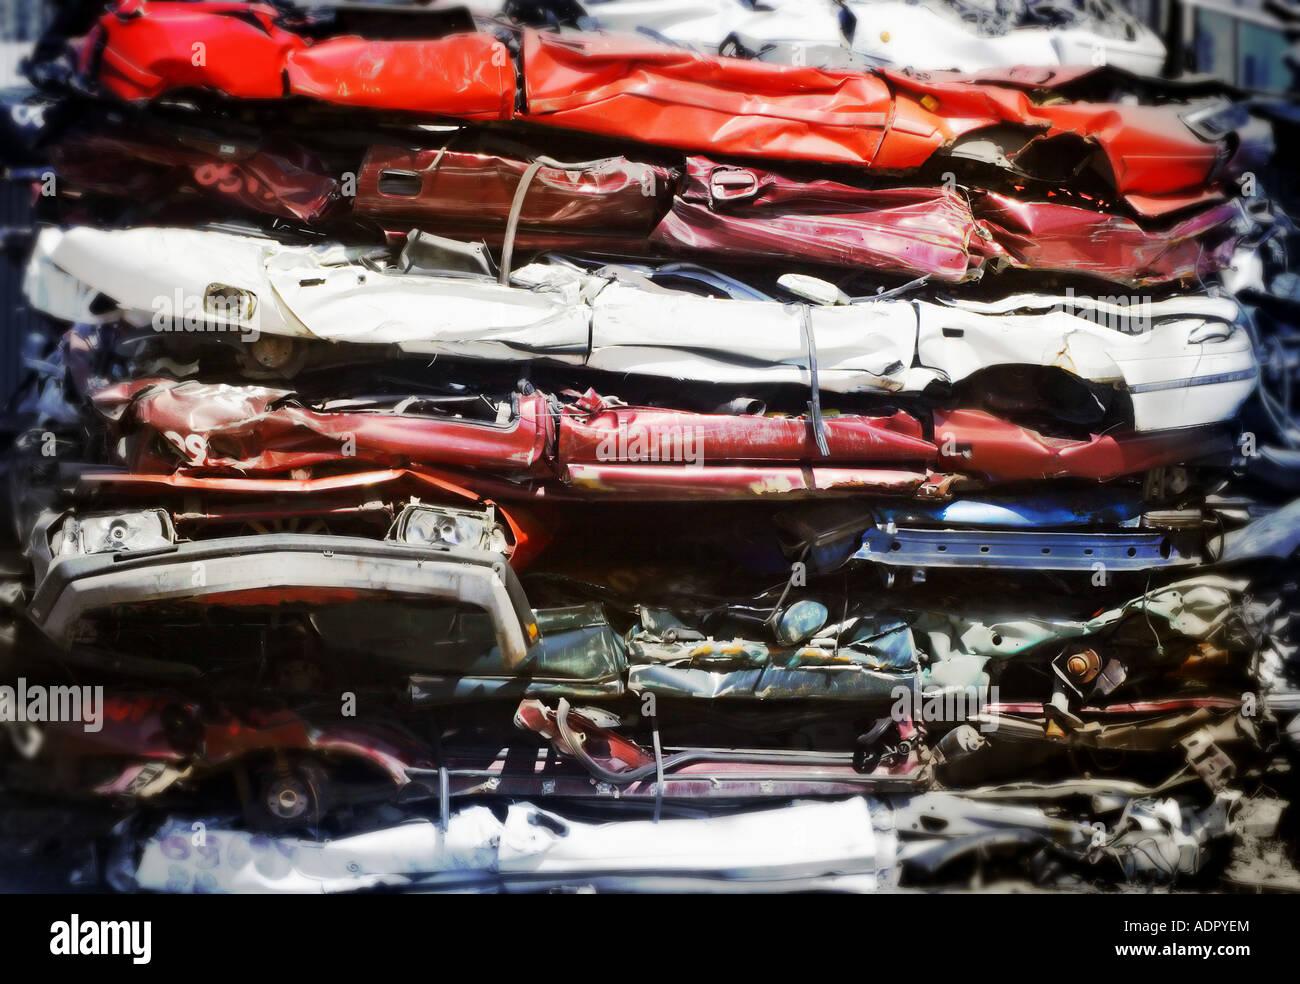 Junkyard full of smashed cars Stock Photo, Royalty Free Image ...